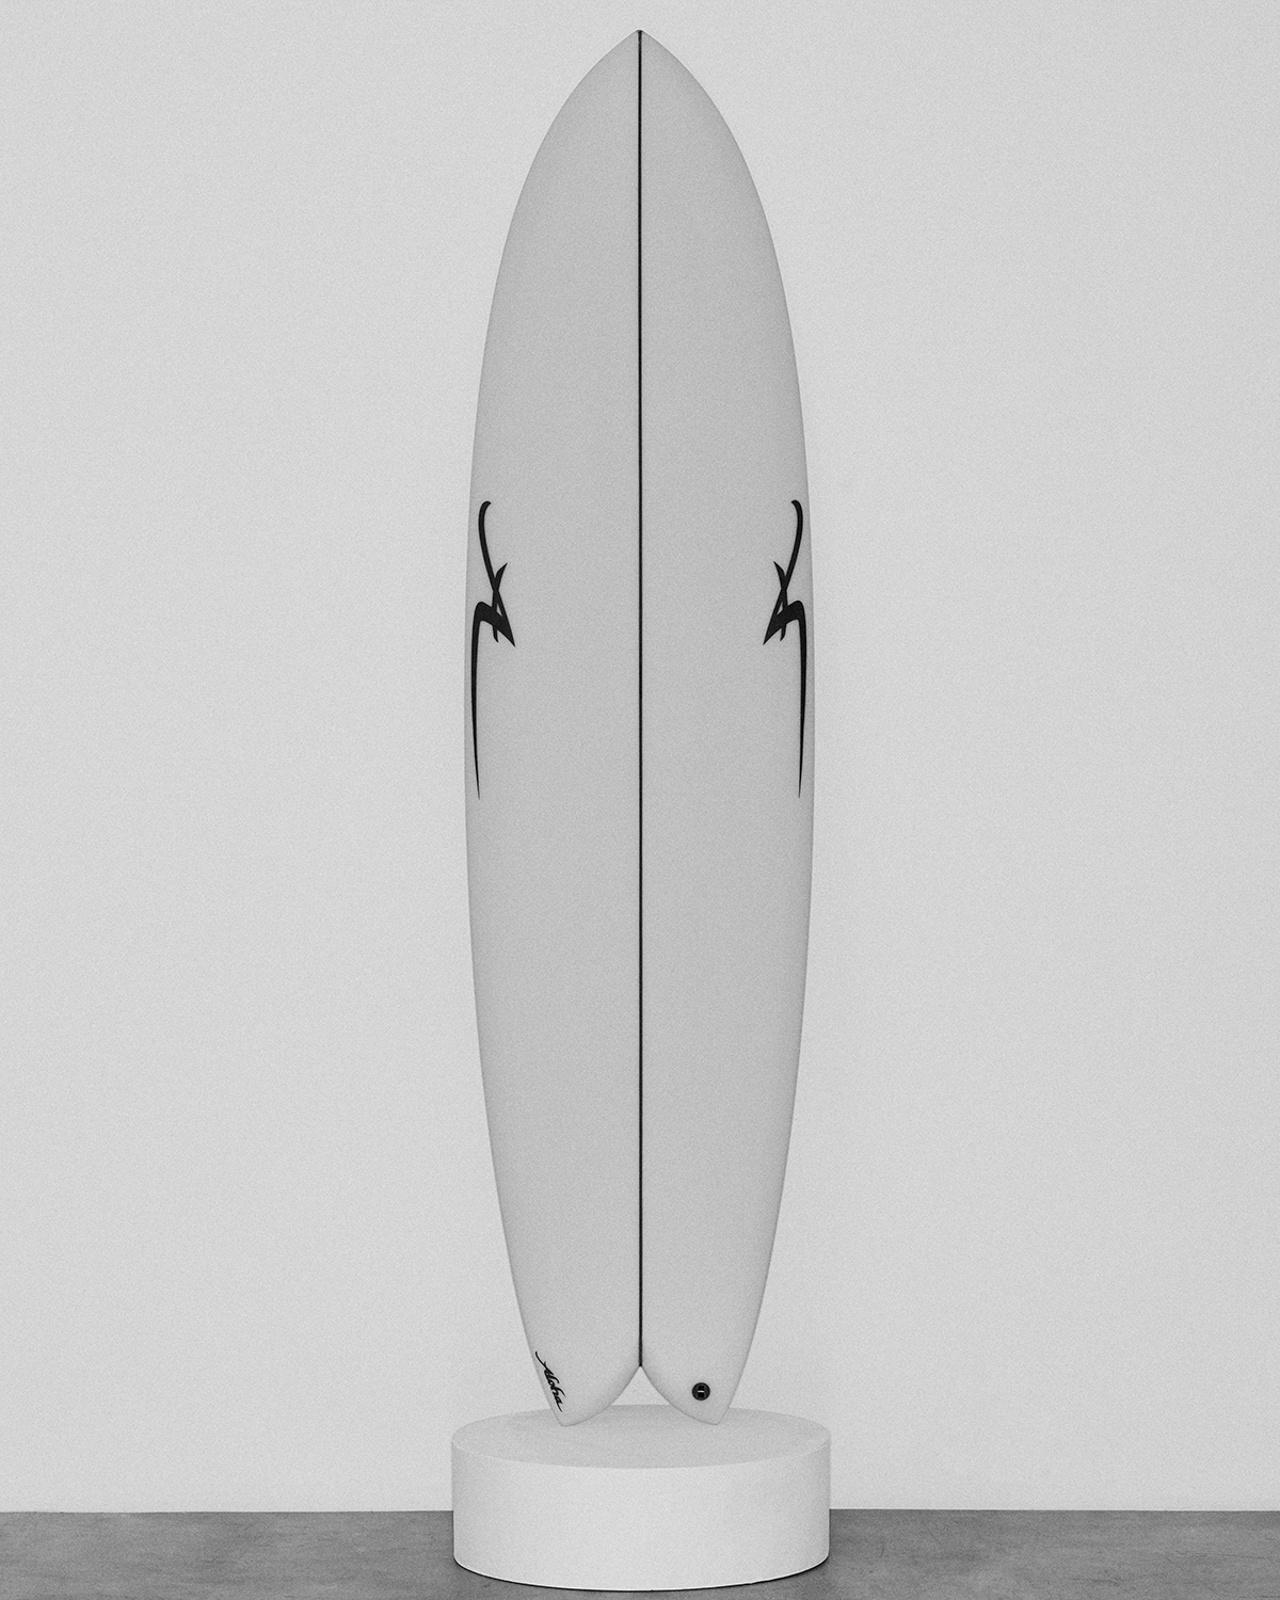 surfboard for expert